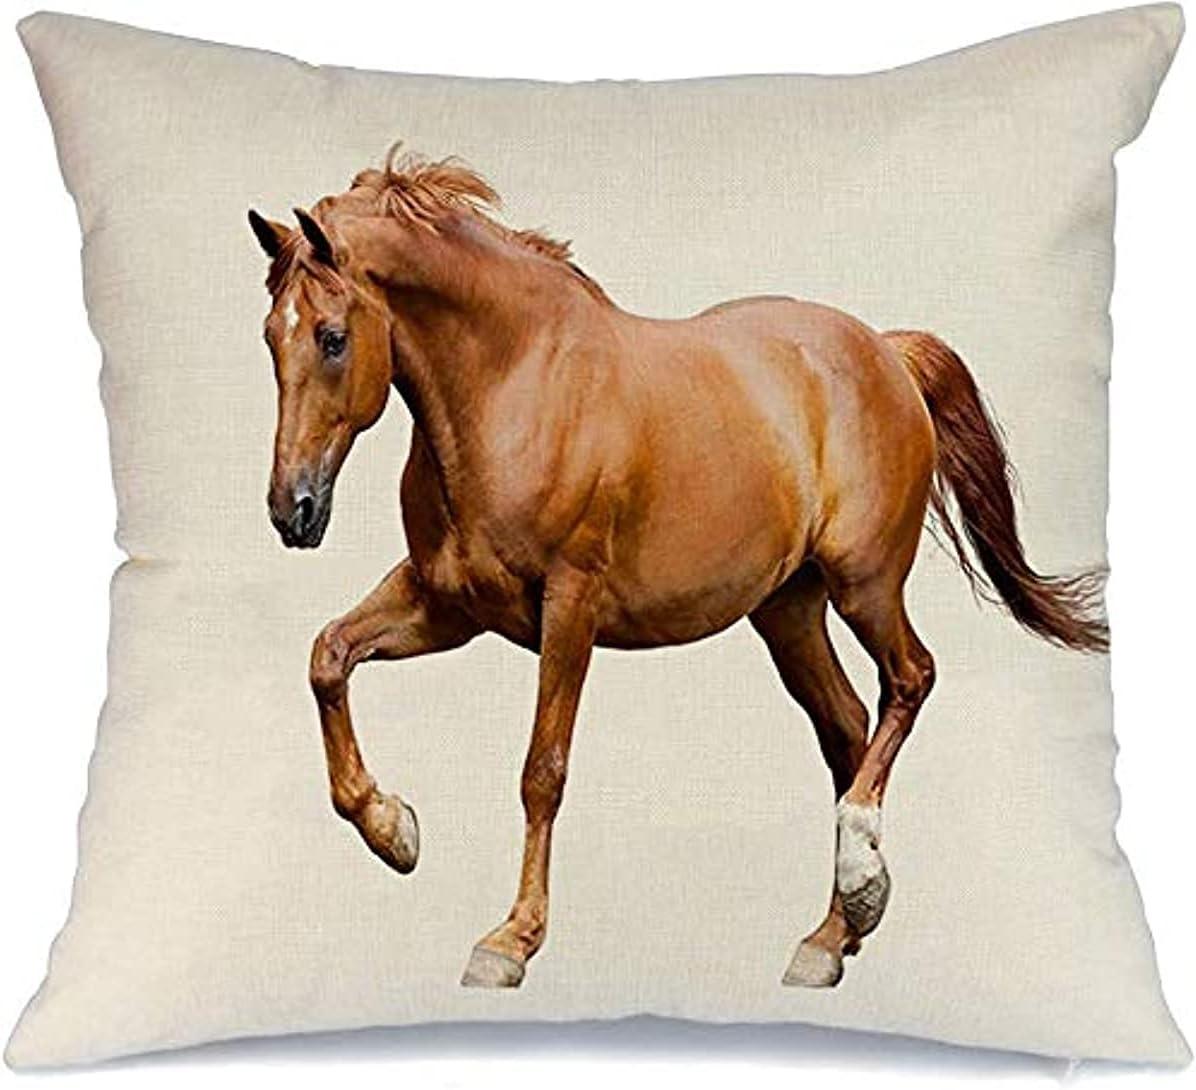 BONRI Almohada decorativa de poliéster con estampado de castaño para correr, elegante crin de caballo, fuerte concienciación, colorido, elegante, blanco naturaleza, cojín cuadrado (45 x 45 cm)